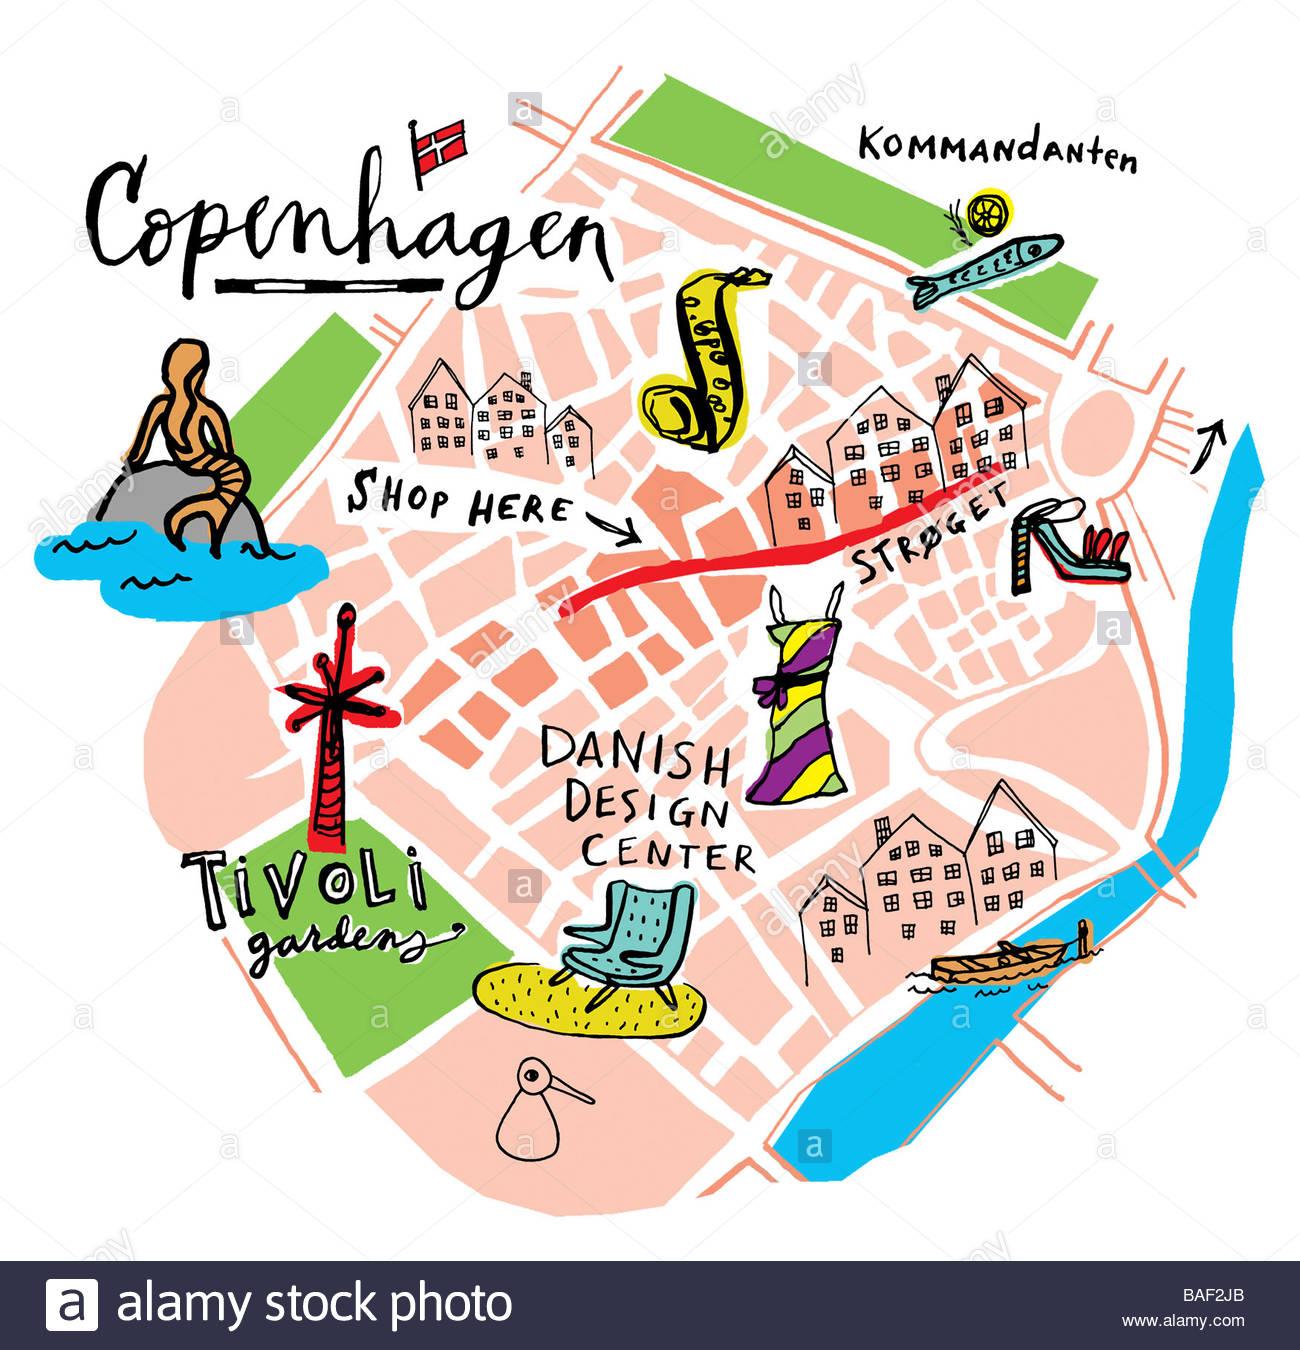 Copenhagen Map Stock Photo 23688291 Alamy